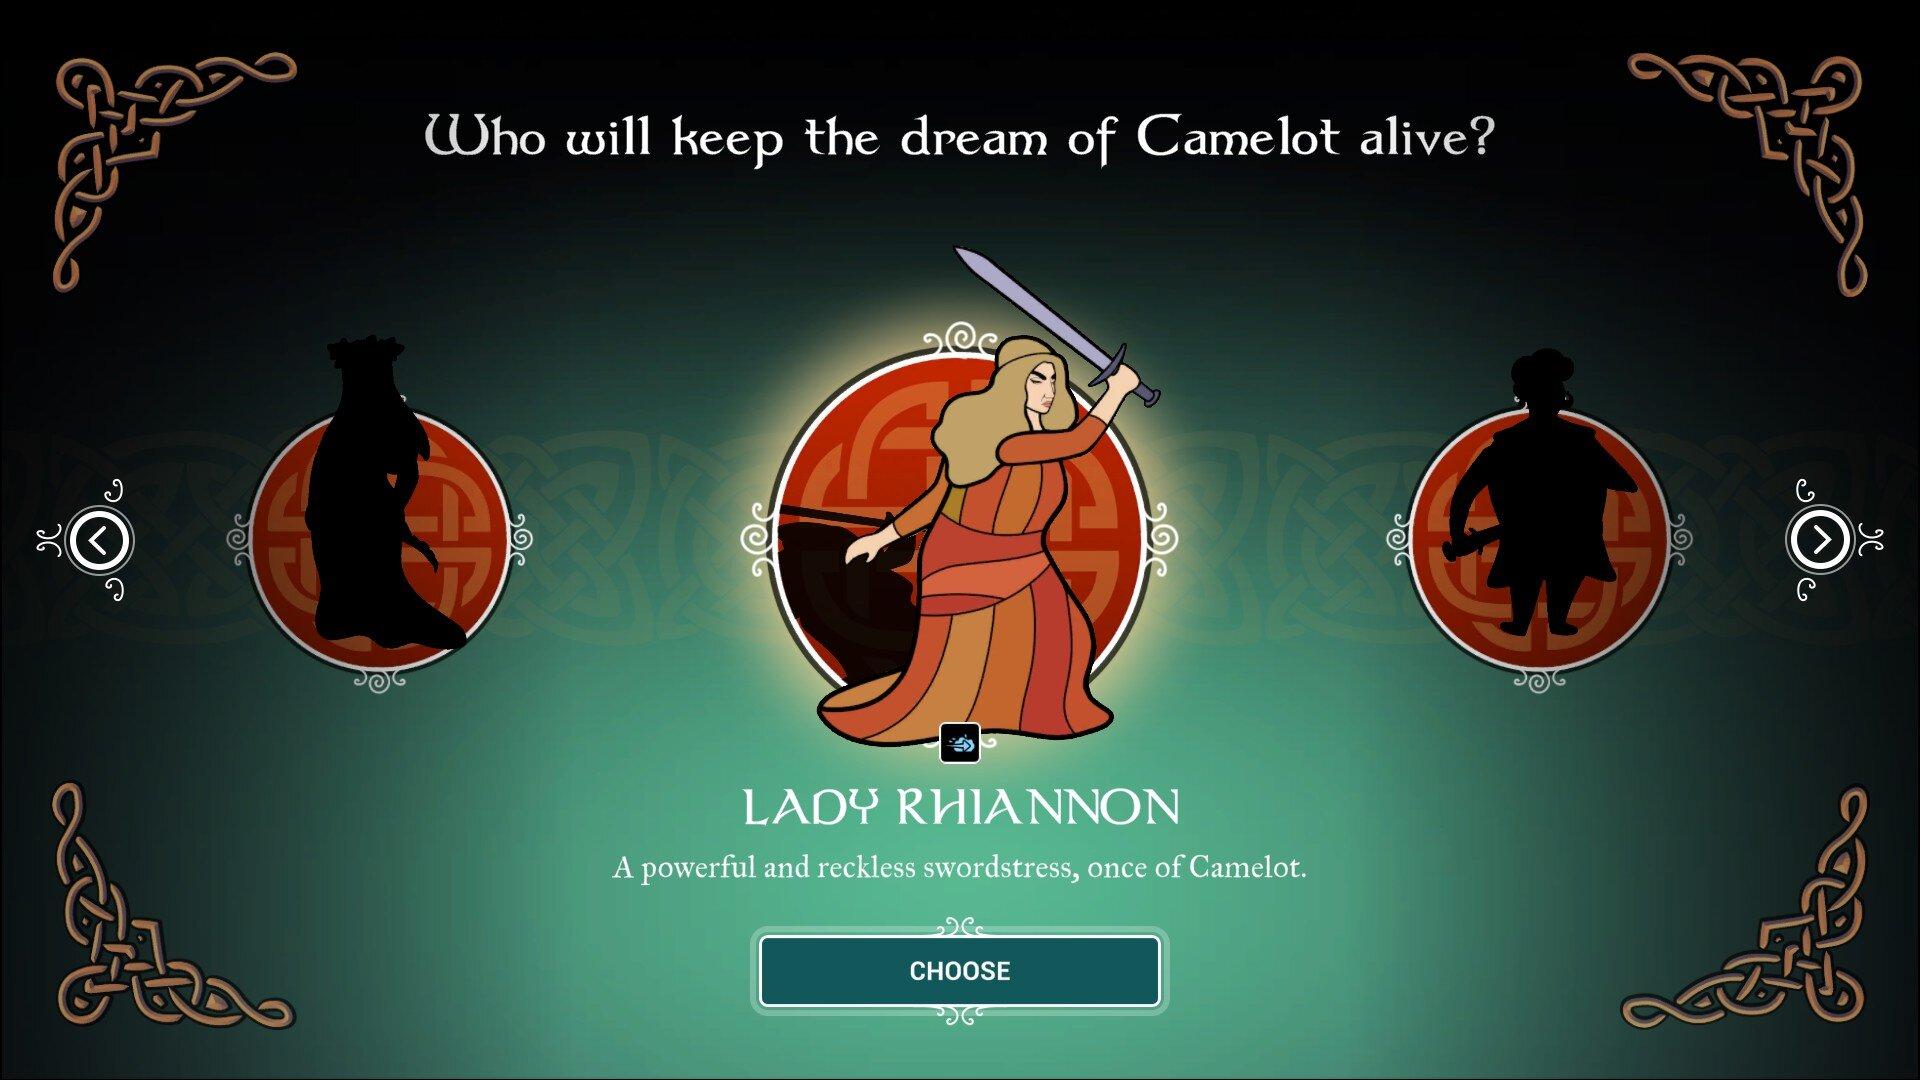 Pendragon_game_screenshot_CharacterSelection